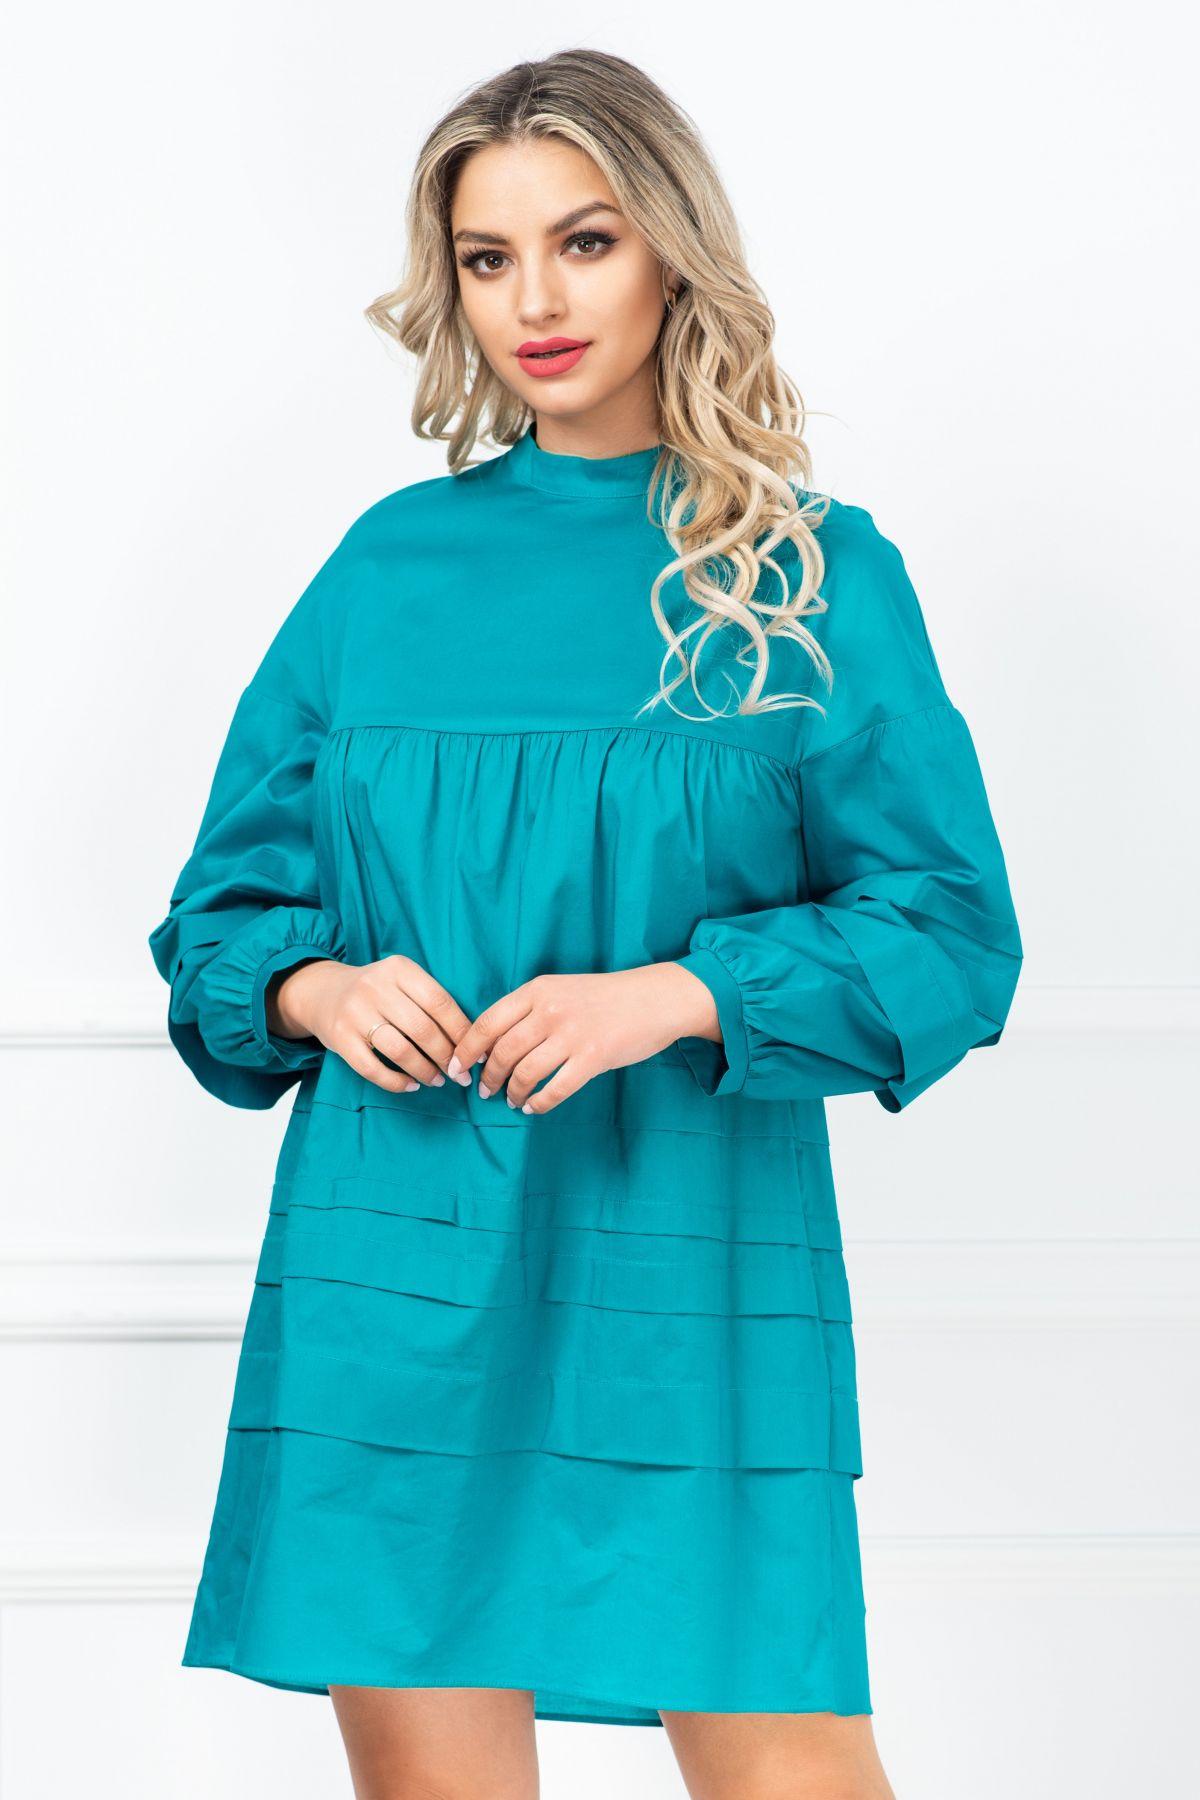 Rochie Xara de zi lejera turquoise din bumbac